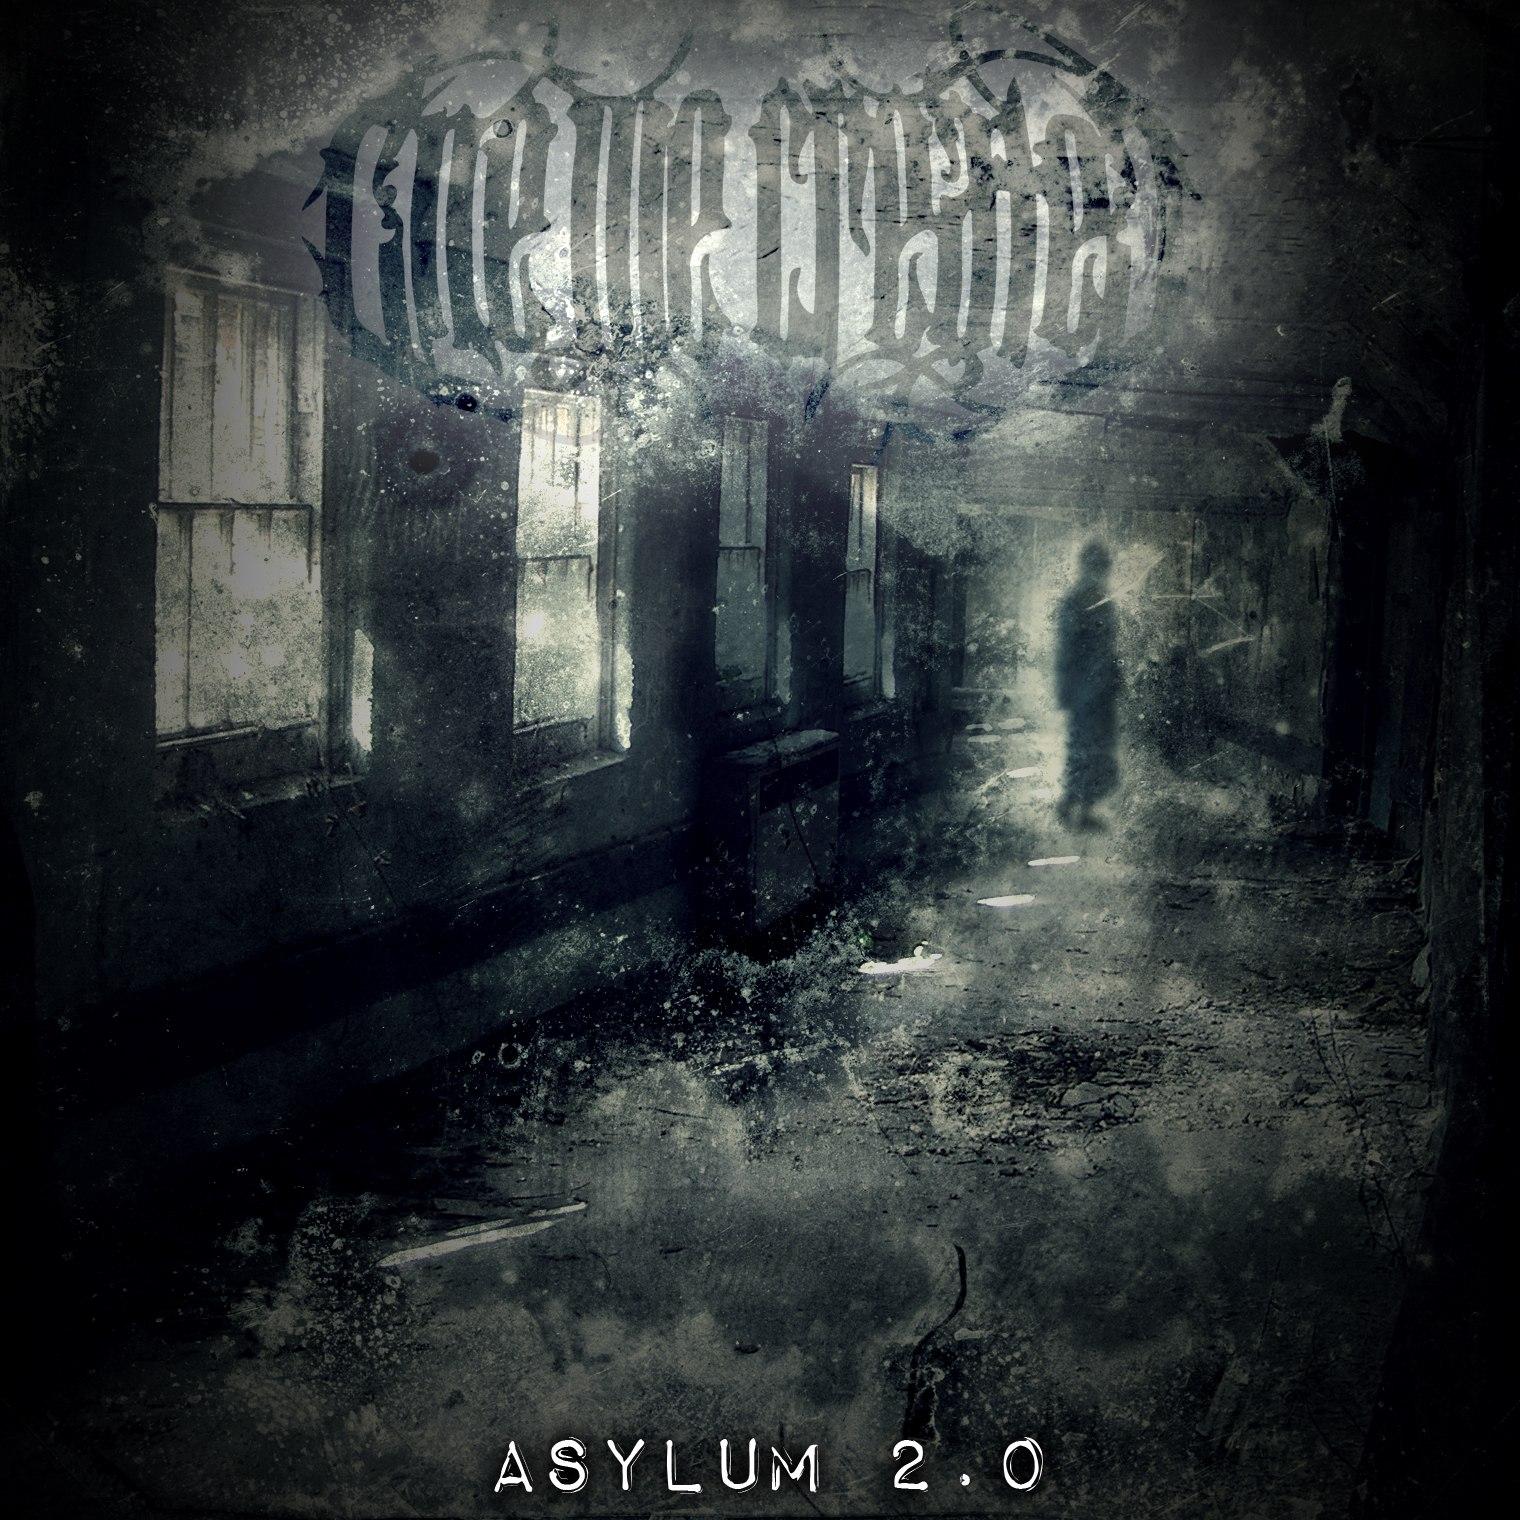 One We Created - Asylum 2.0 [EP] (2012)